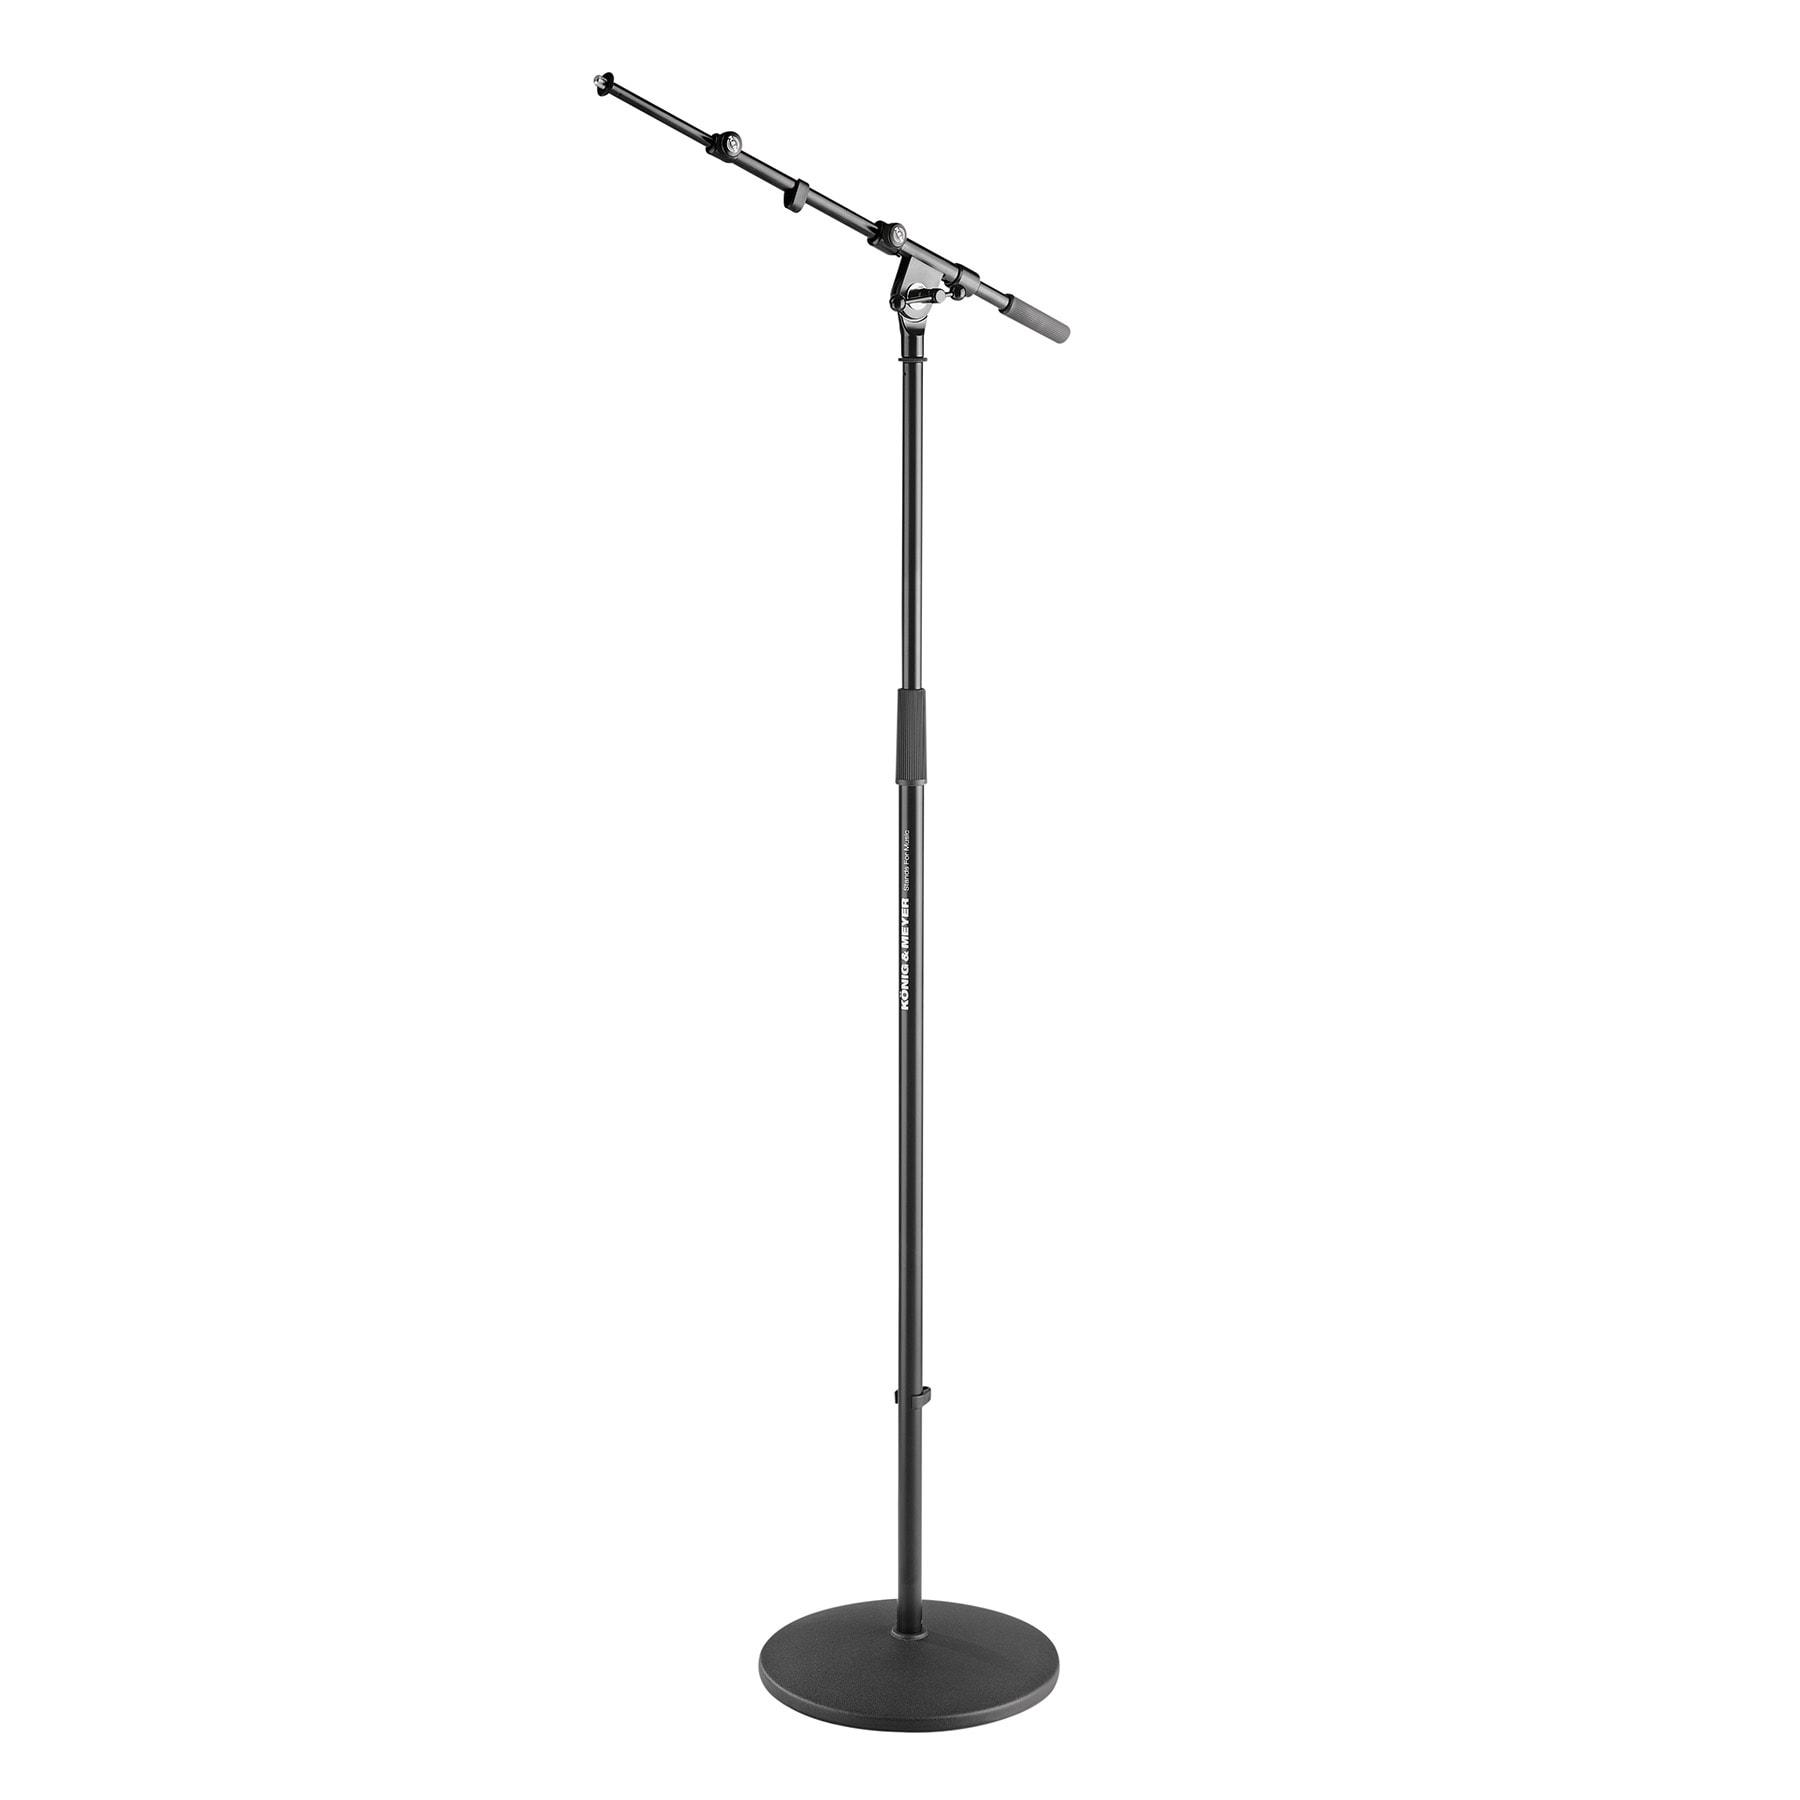 KM26145 - Microphone stand